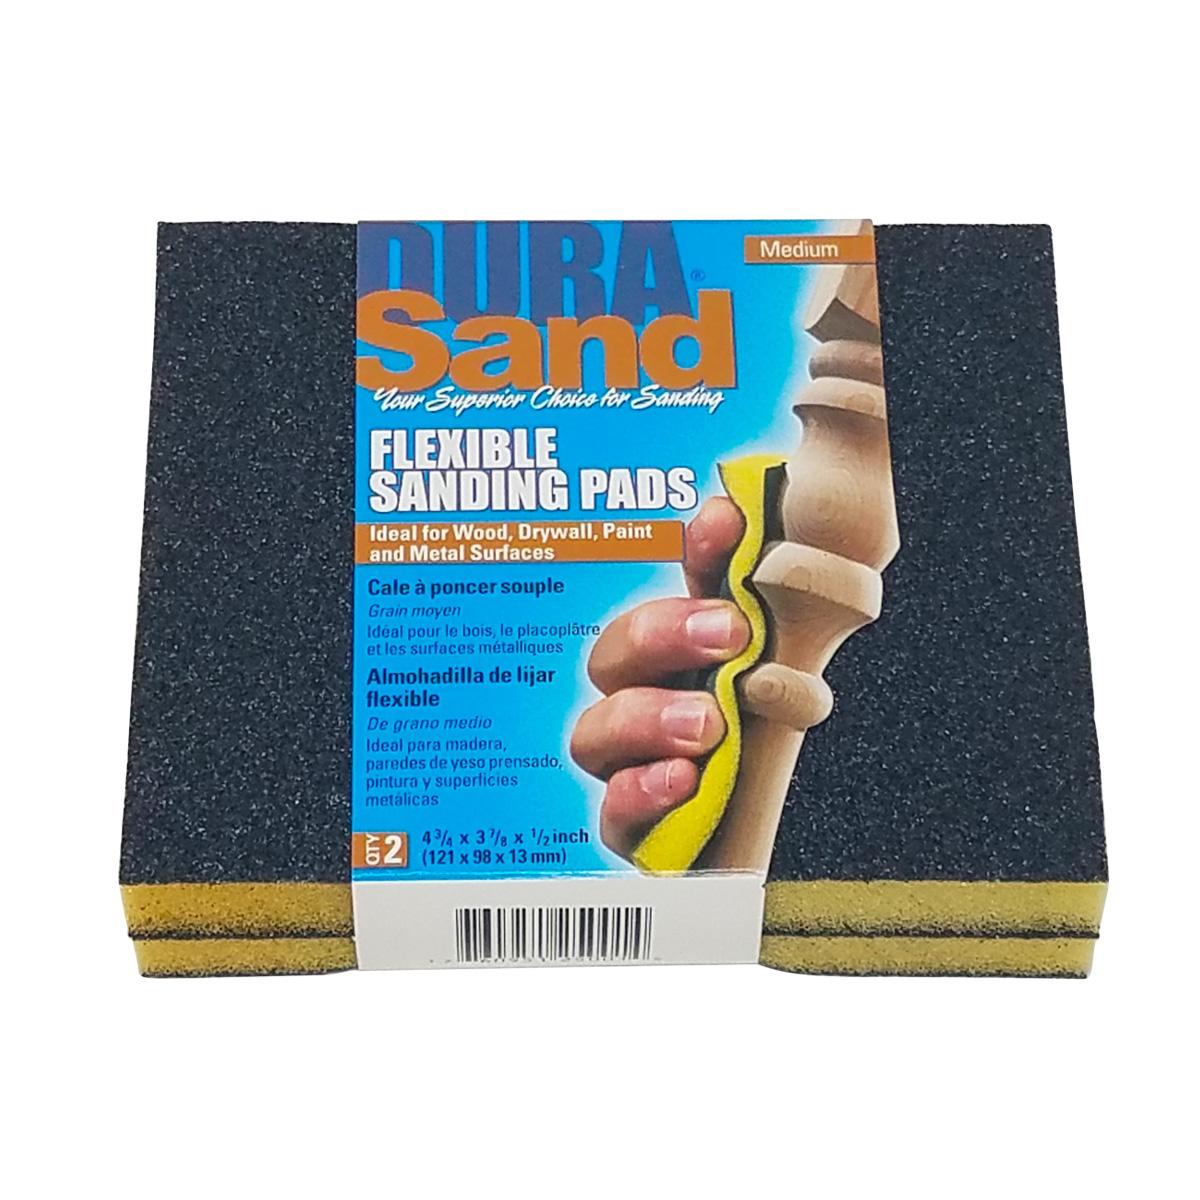 2-Sided Black Sanding Pads, 2pcs, Medium - 100 Grit